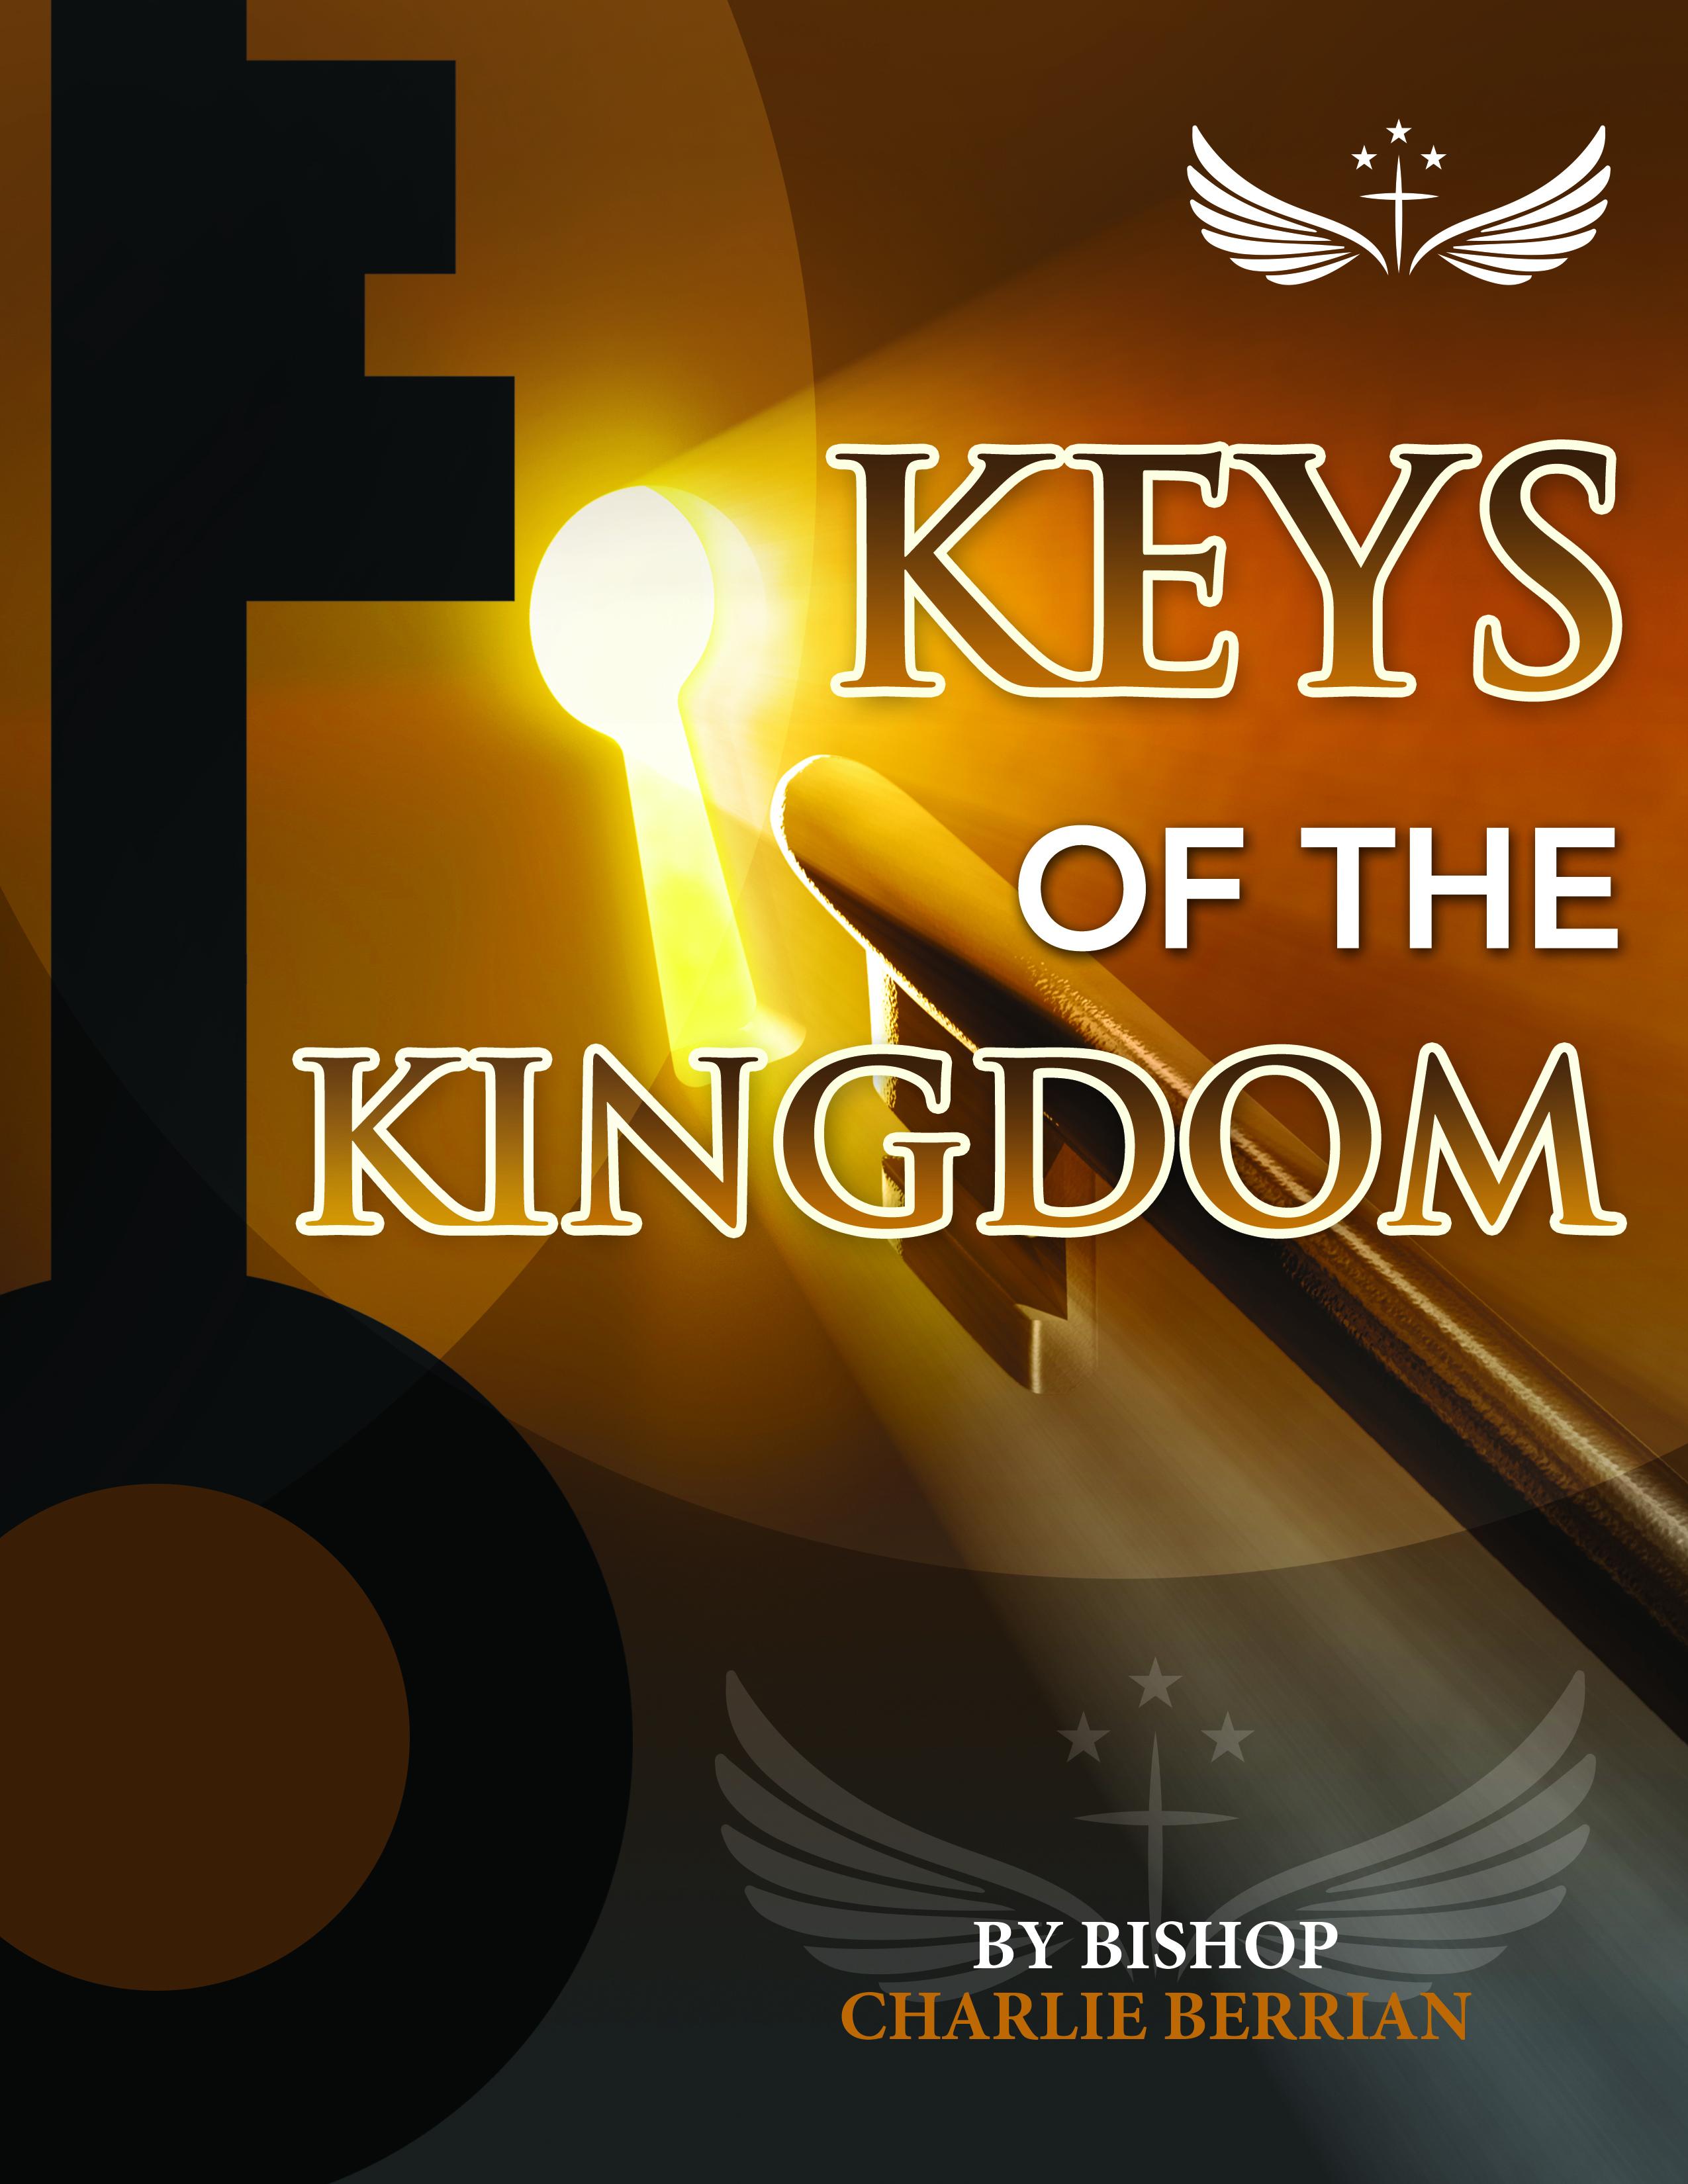 CB-Keys of the Kingdom-ebook cover-02